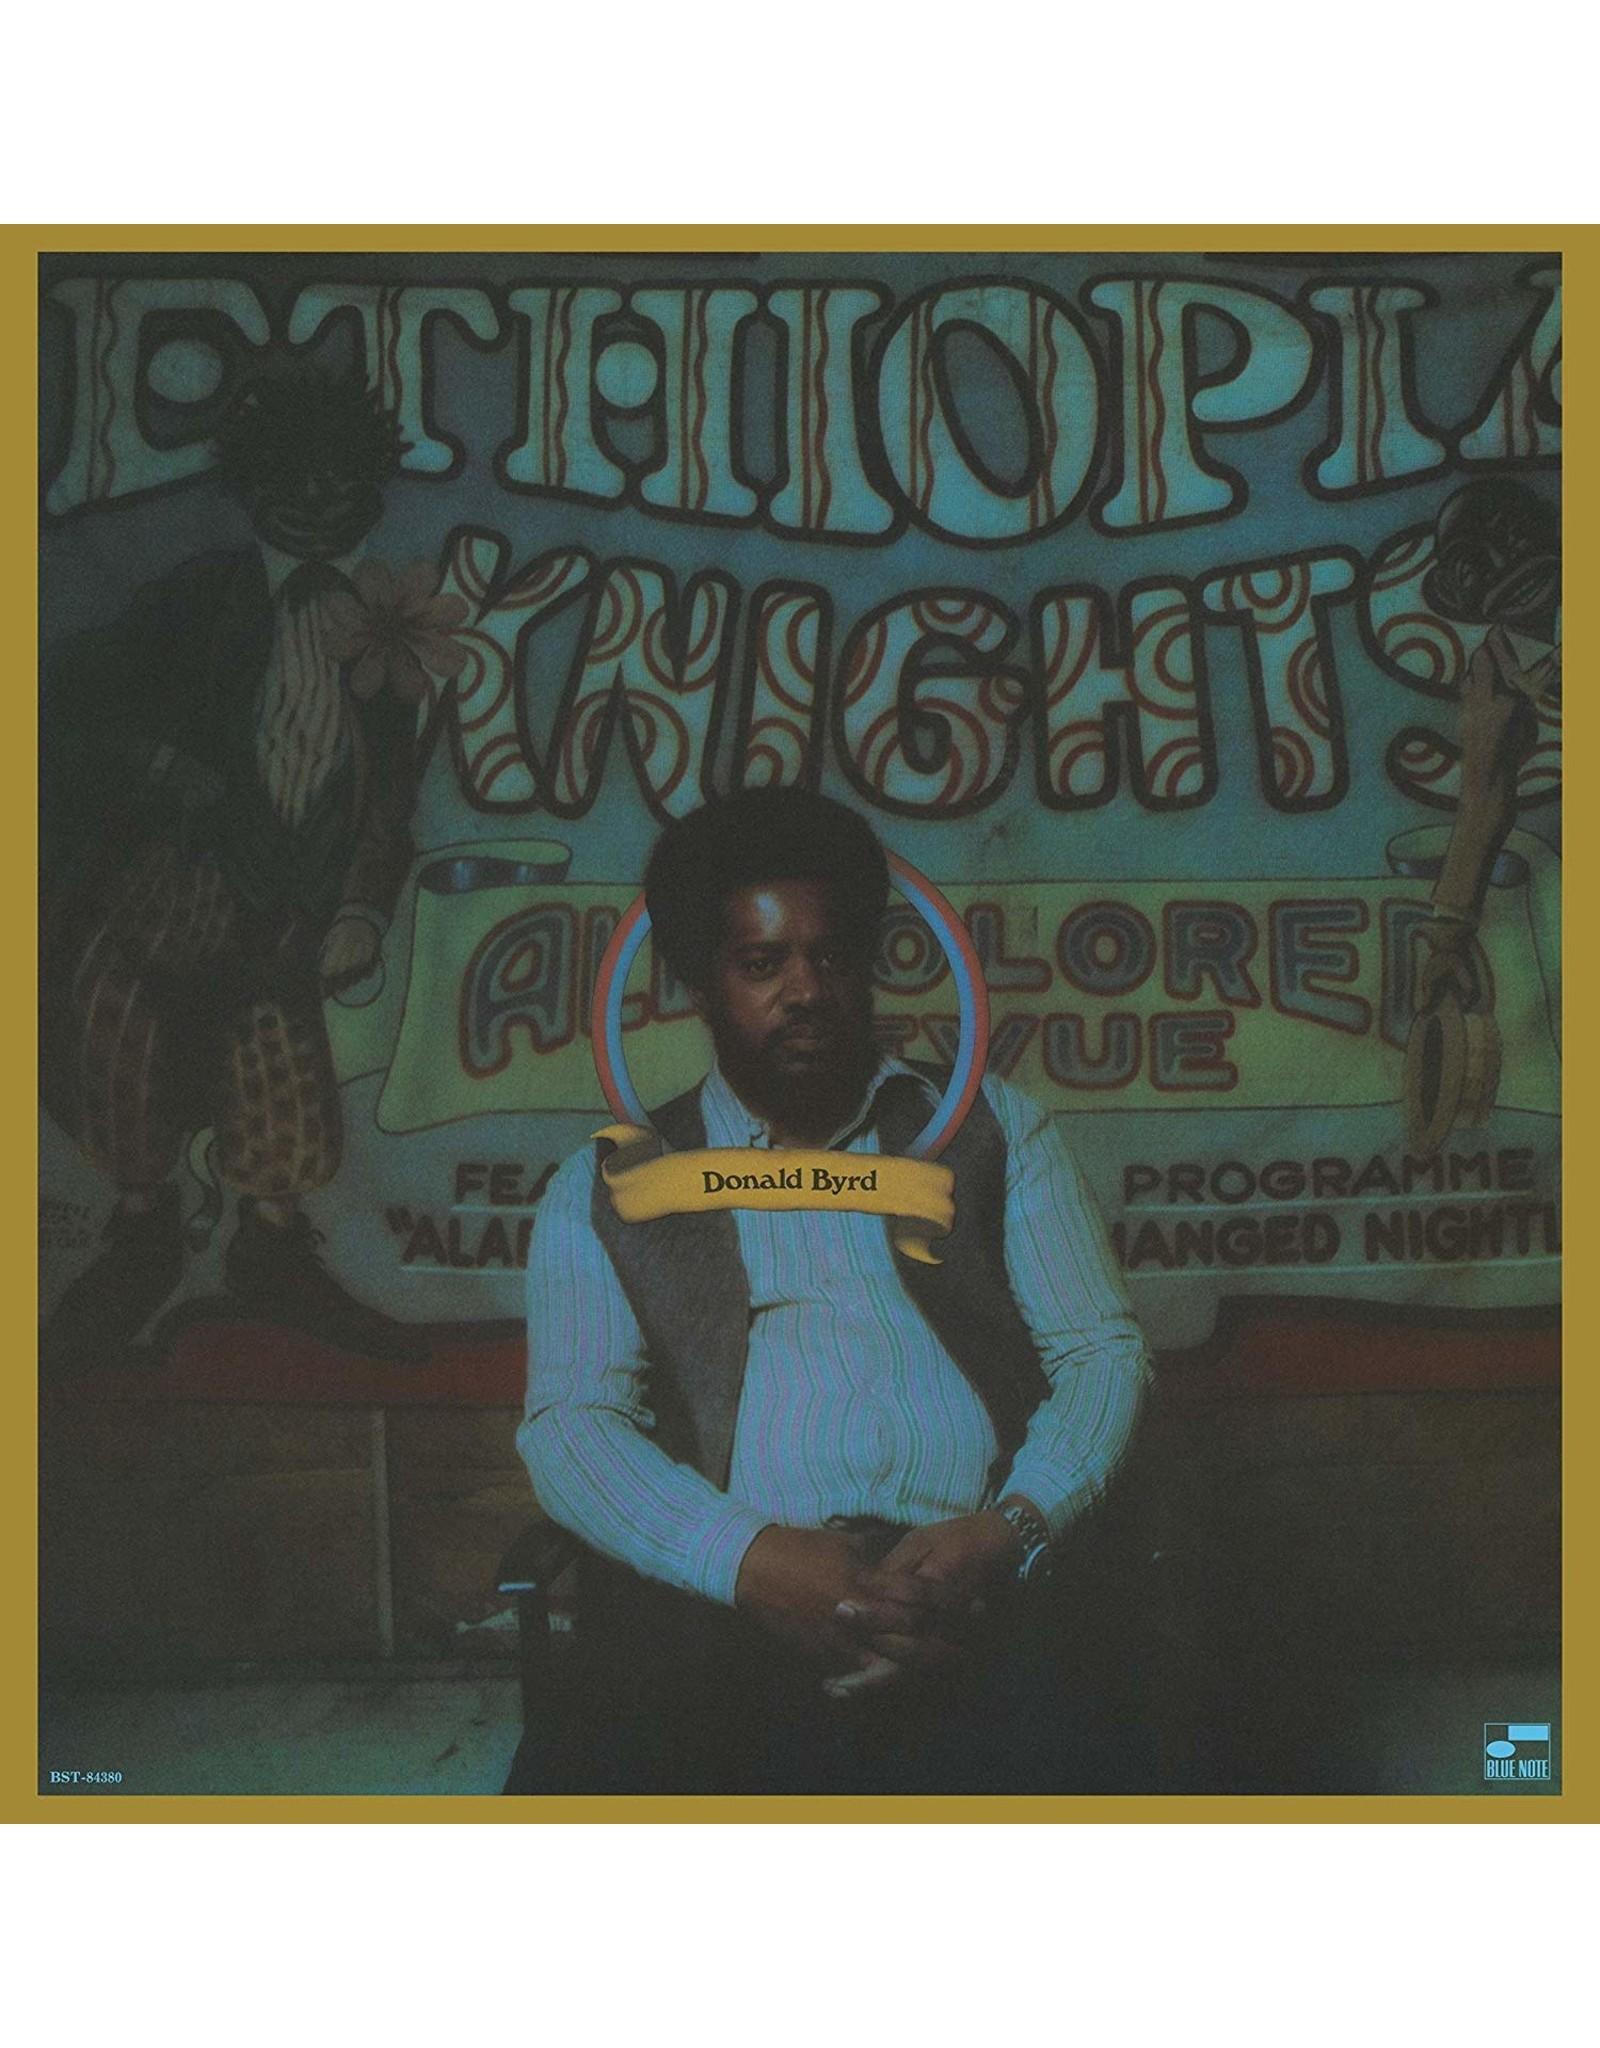 Donald Byrd - Ethiopian Nights